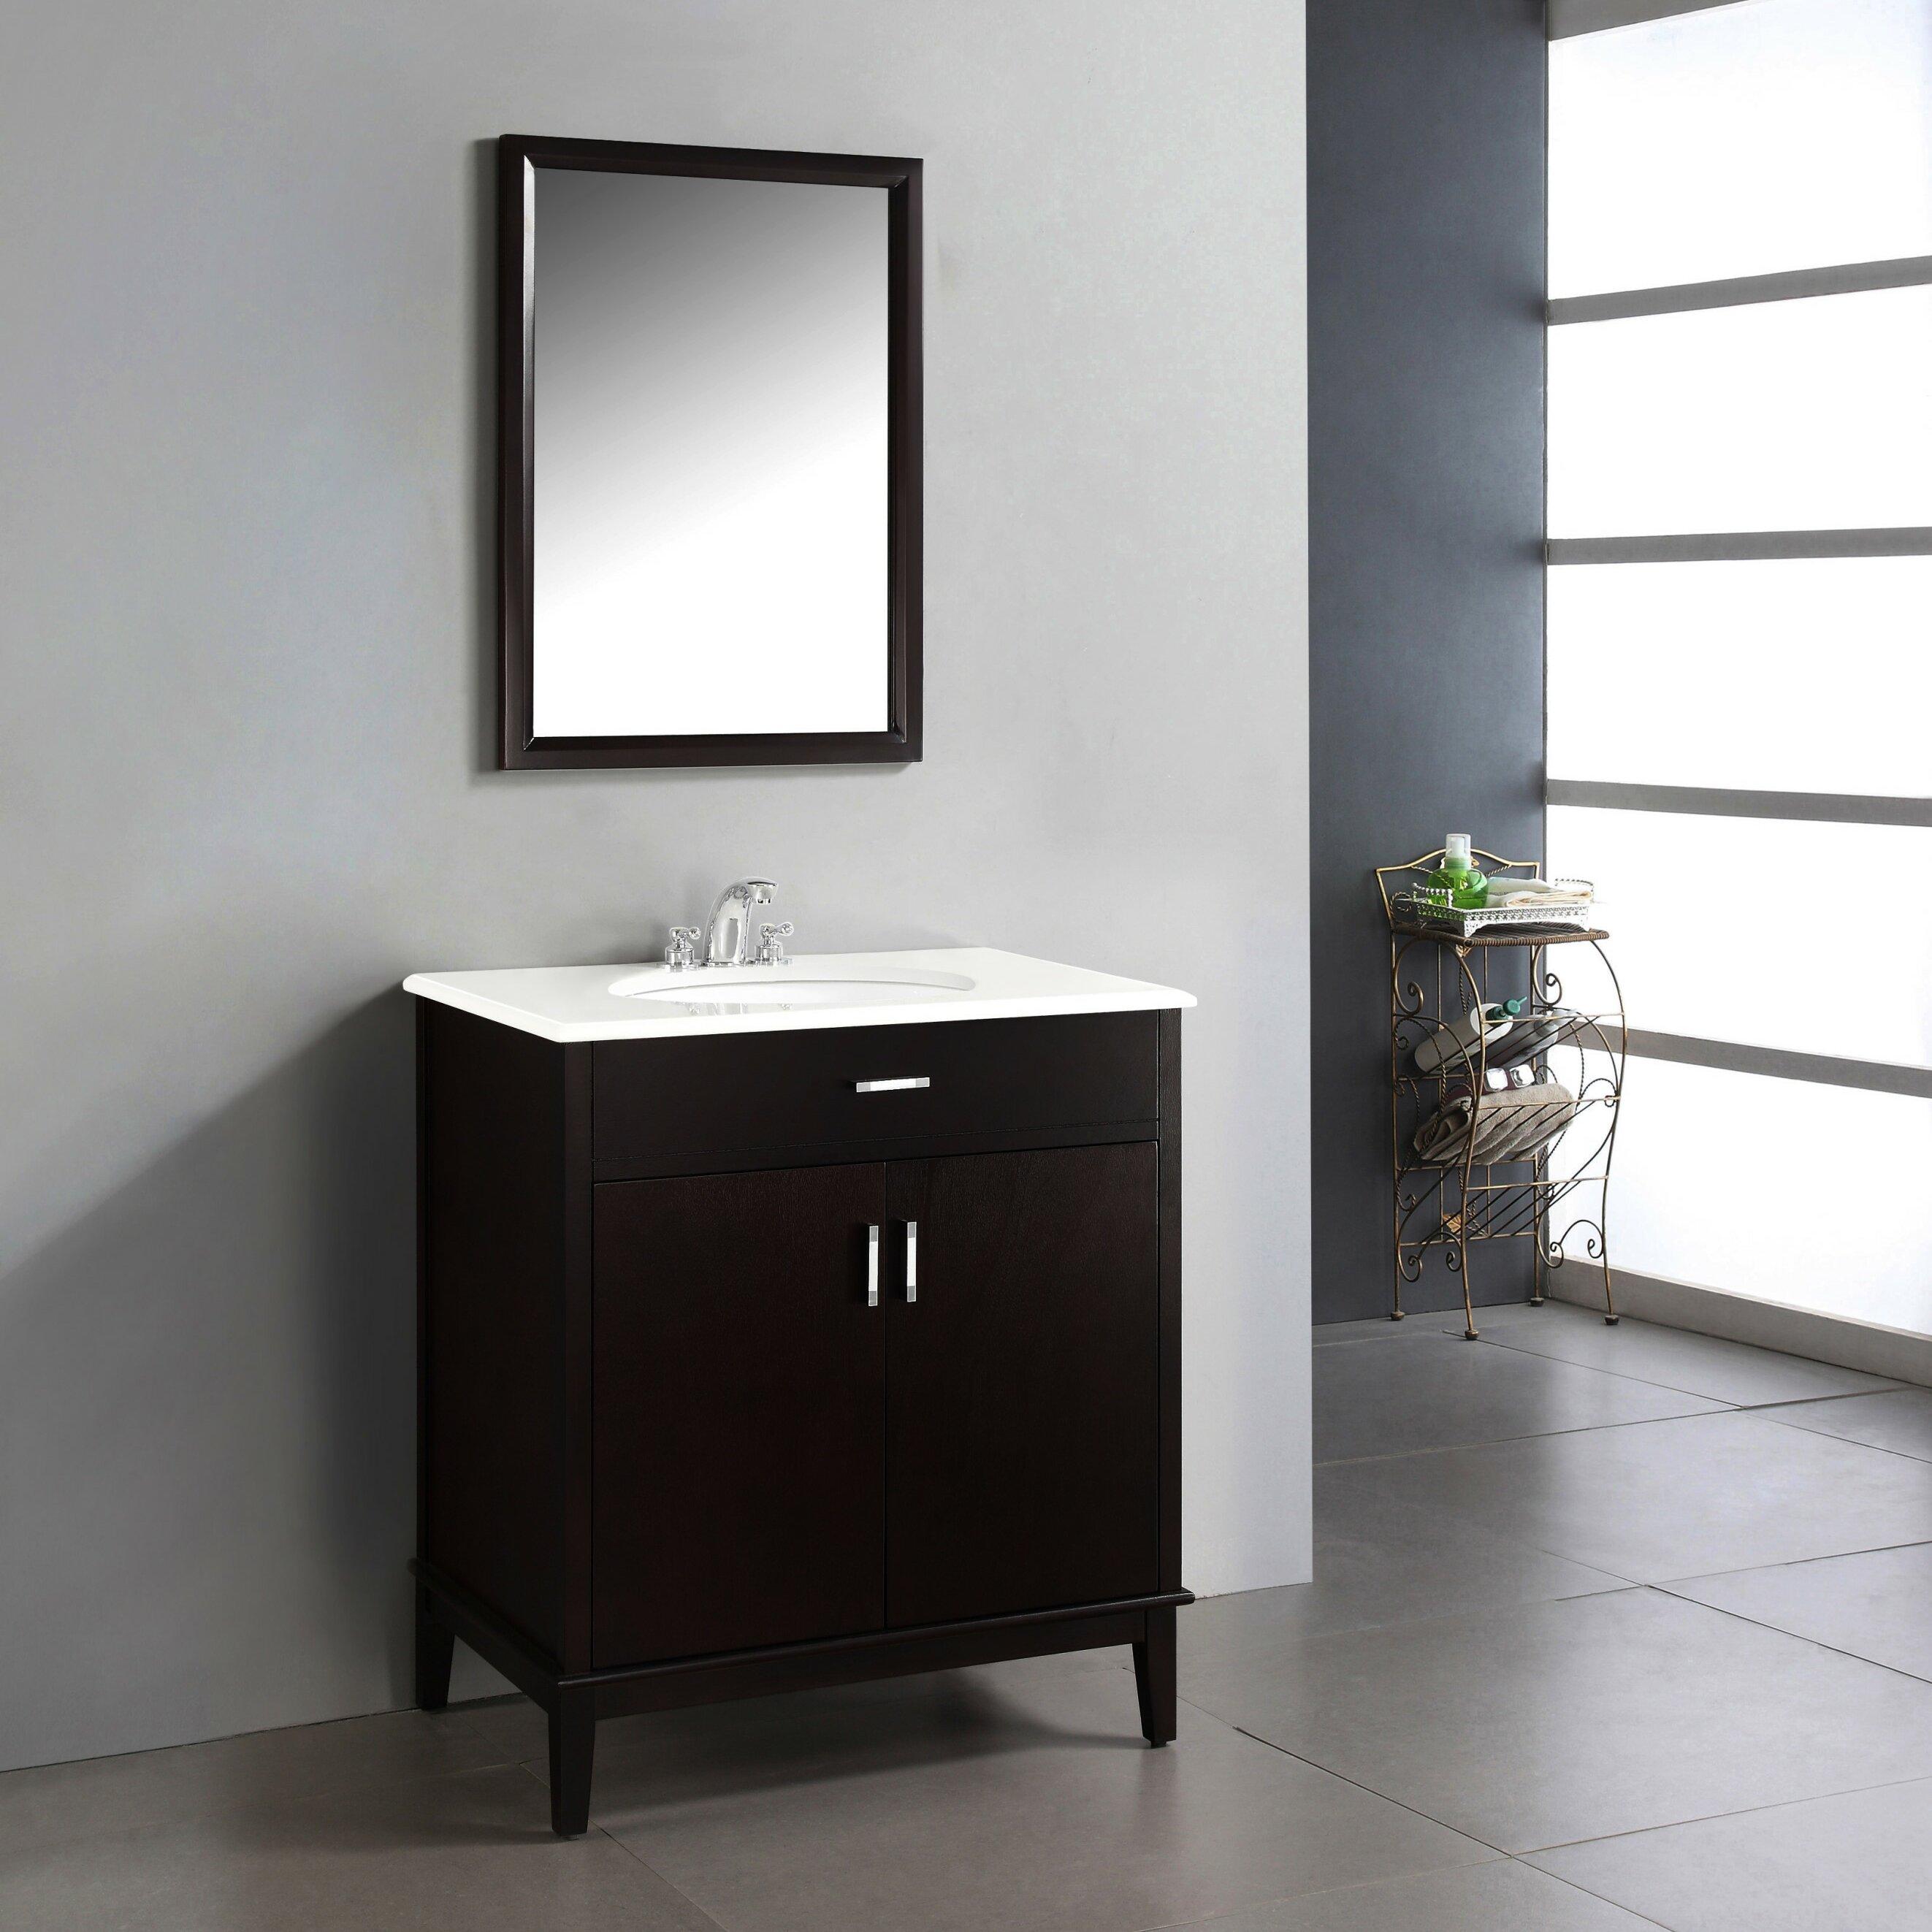 "simpli home urban loft 31"" single bathroom vanity set & reviews"